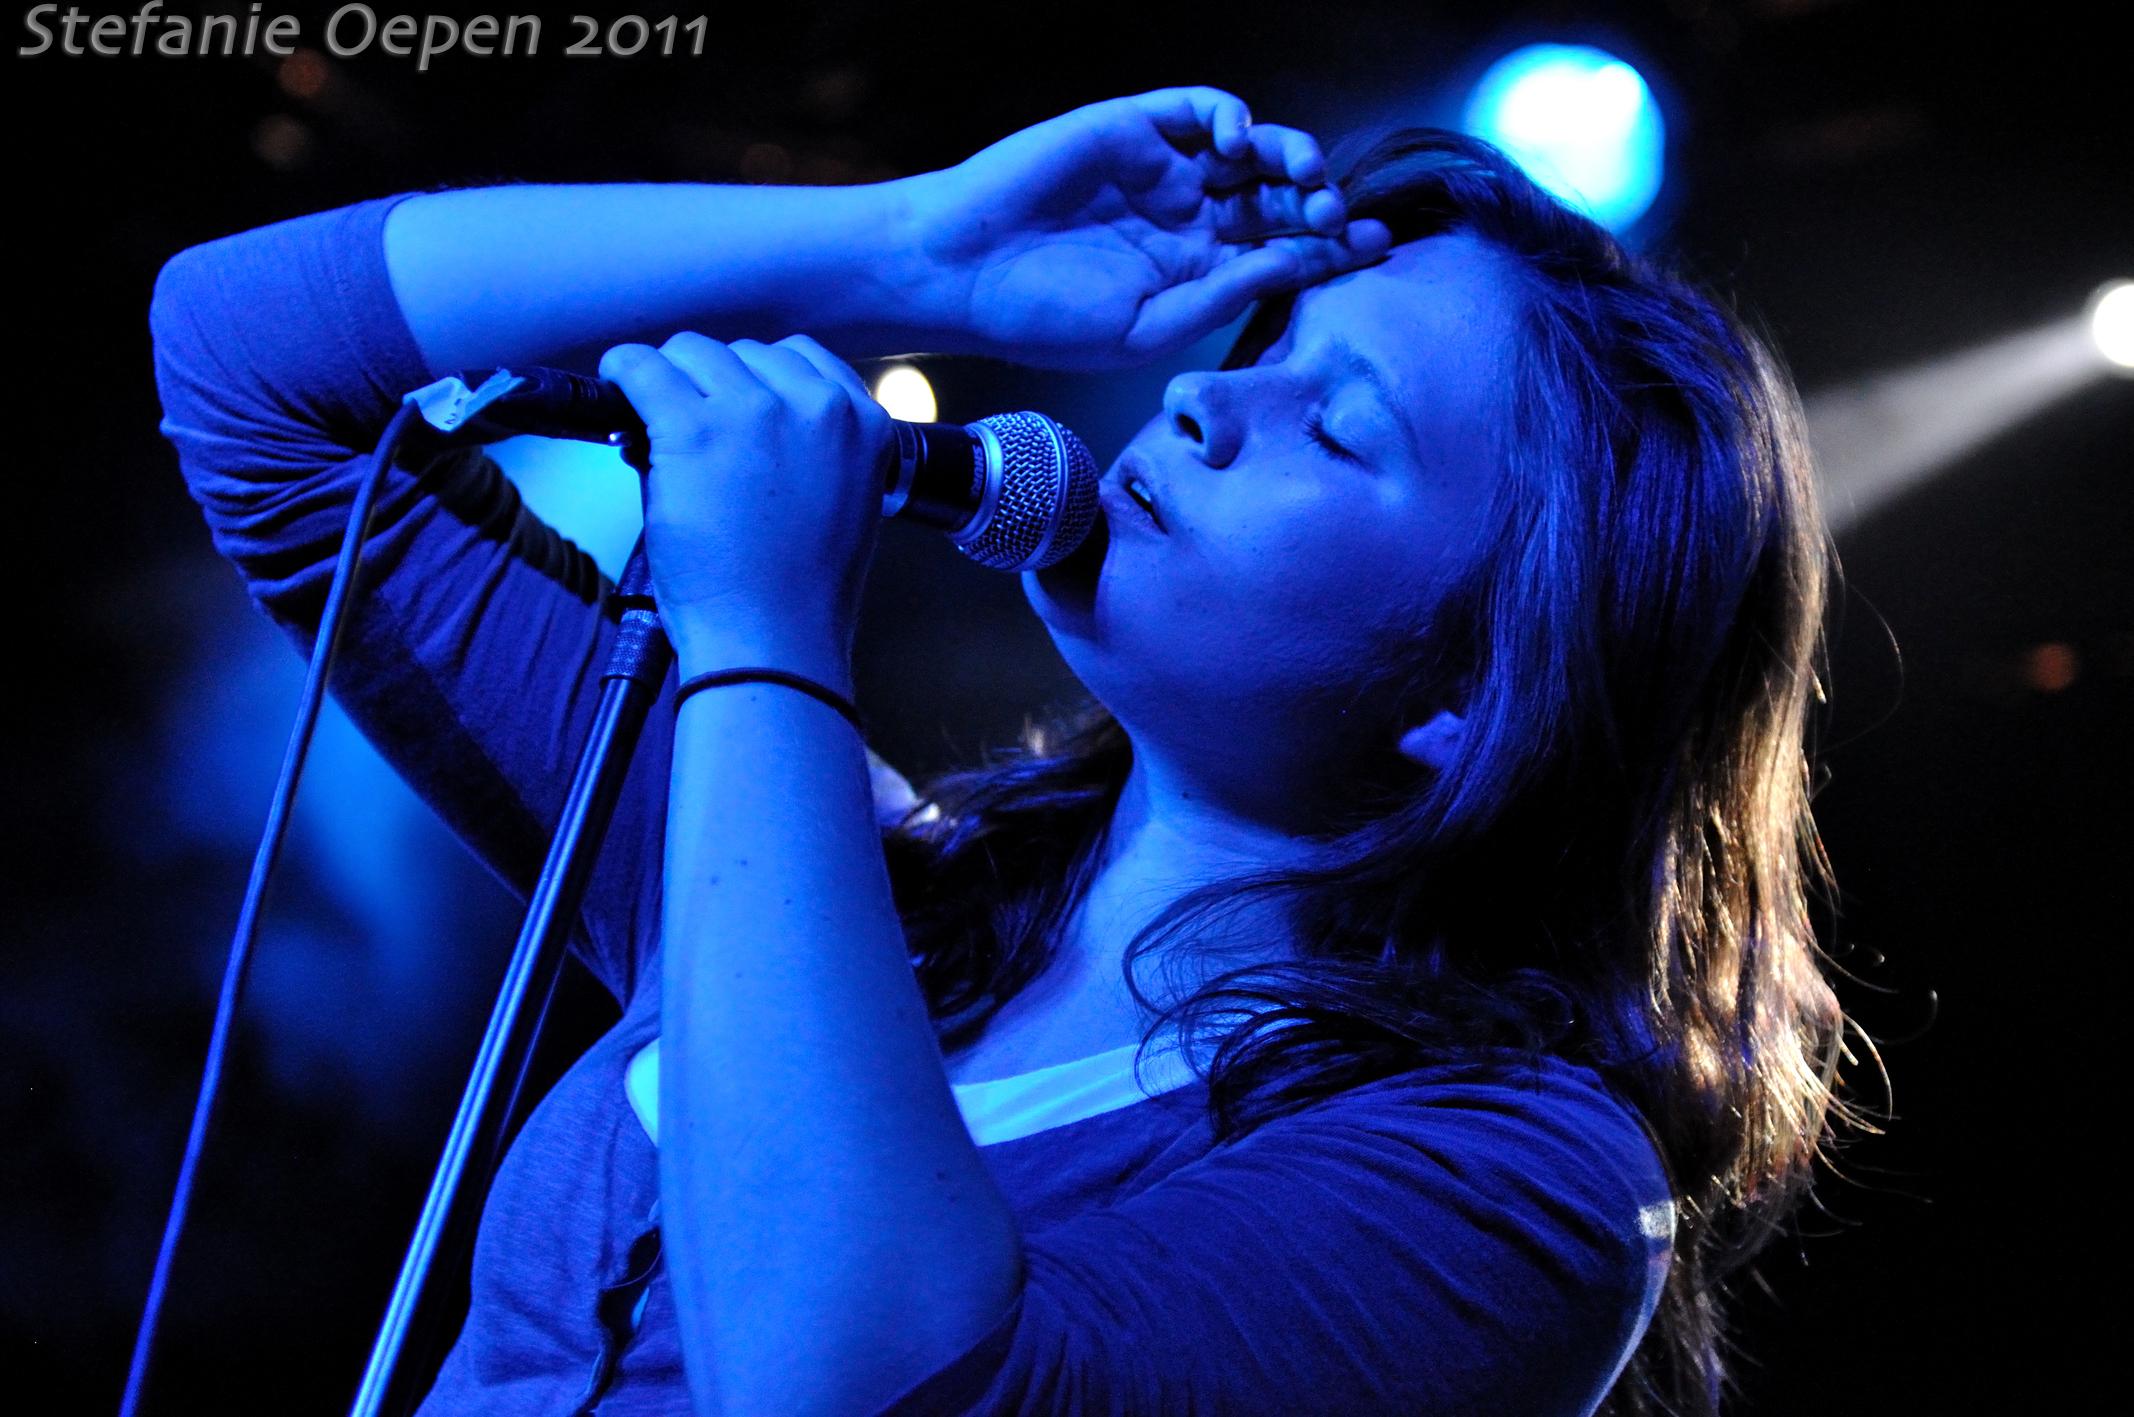 Katrin Biniasch (Oh, Napoleon); Dortmund 2011